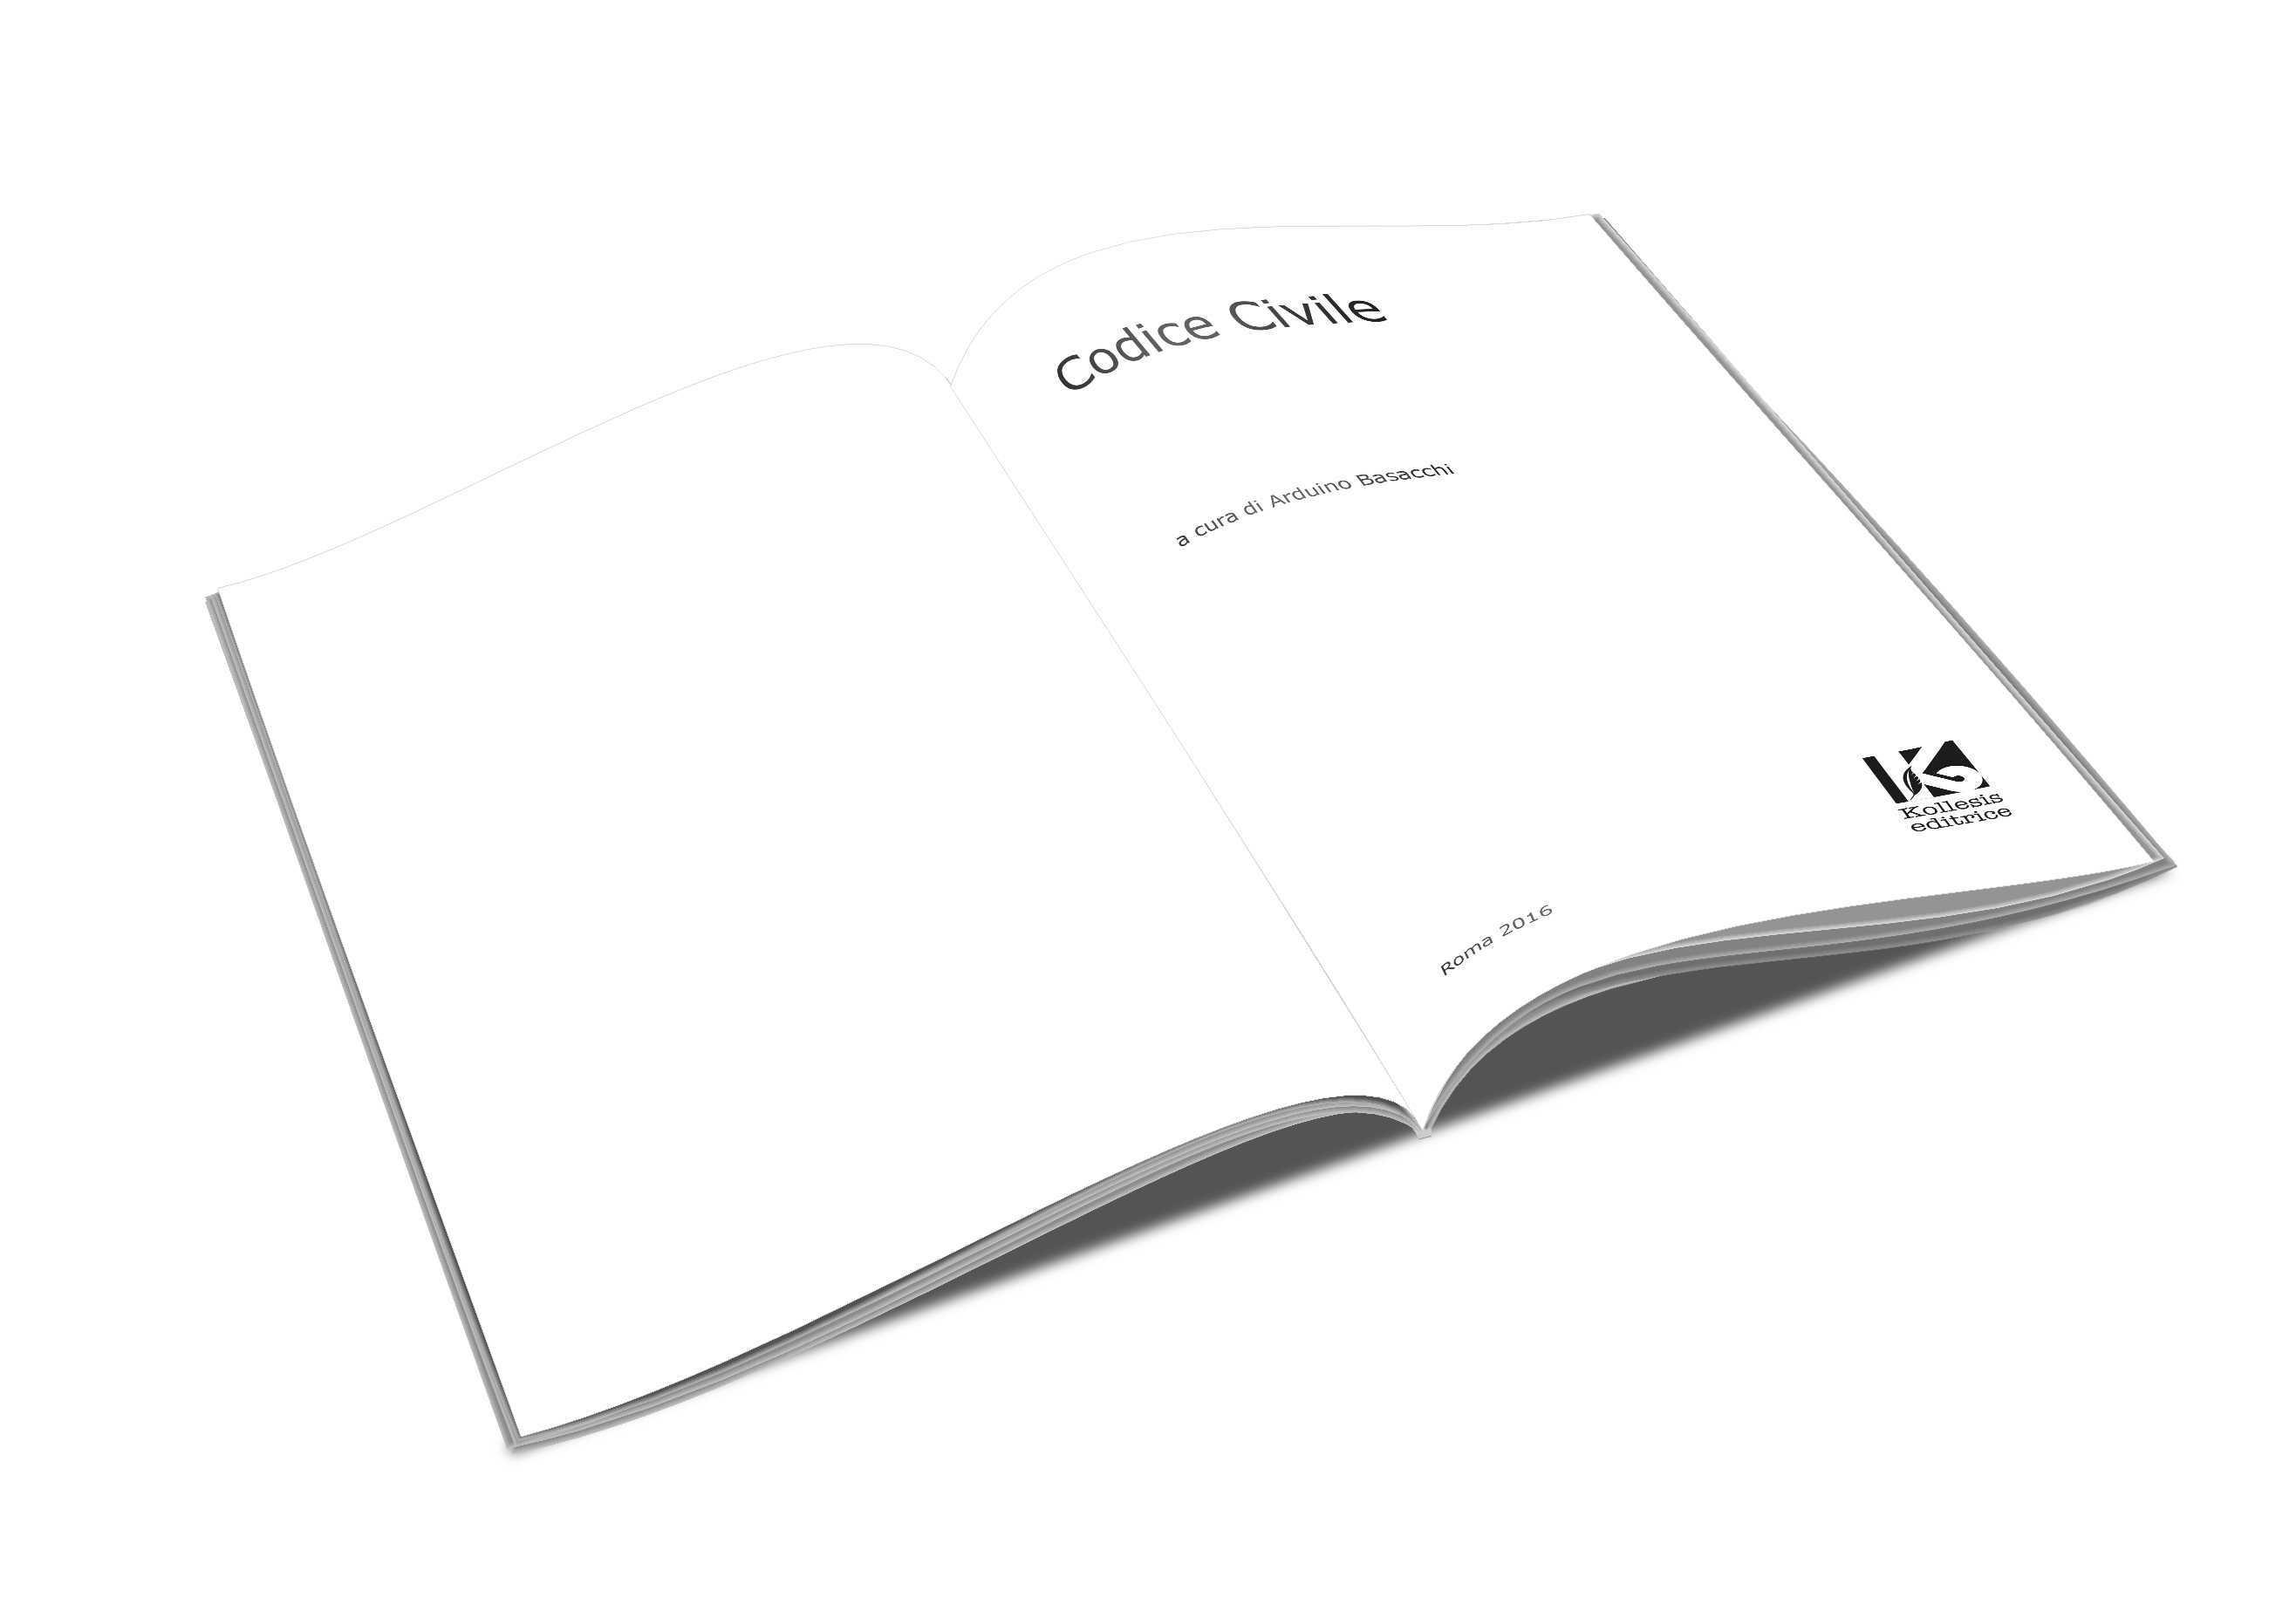 codice-civile-kollesis-ccApertaFronte -web